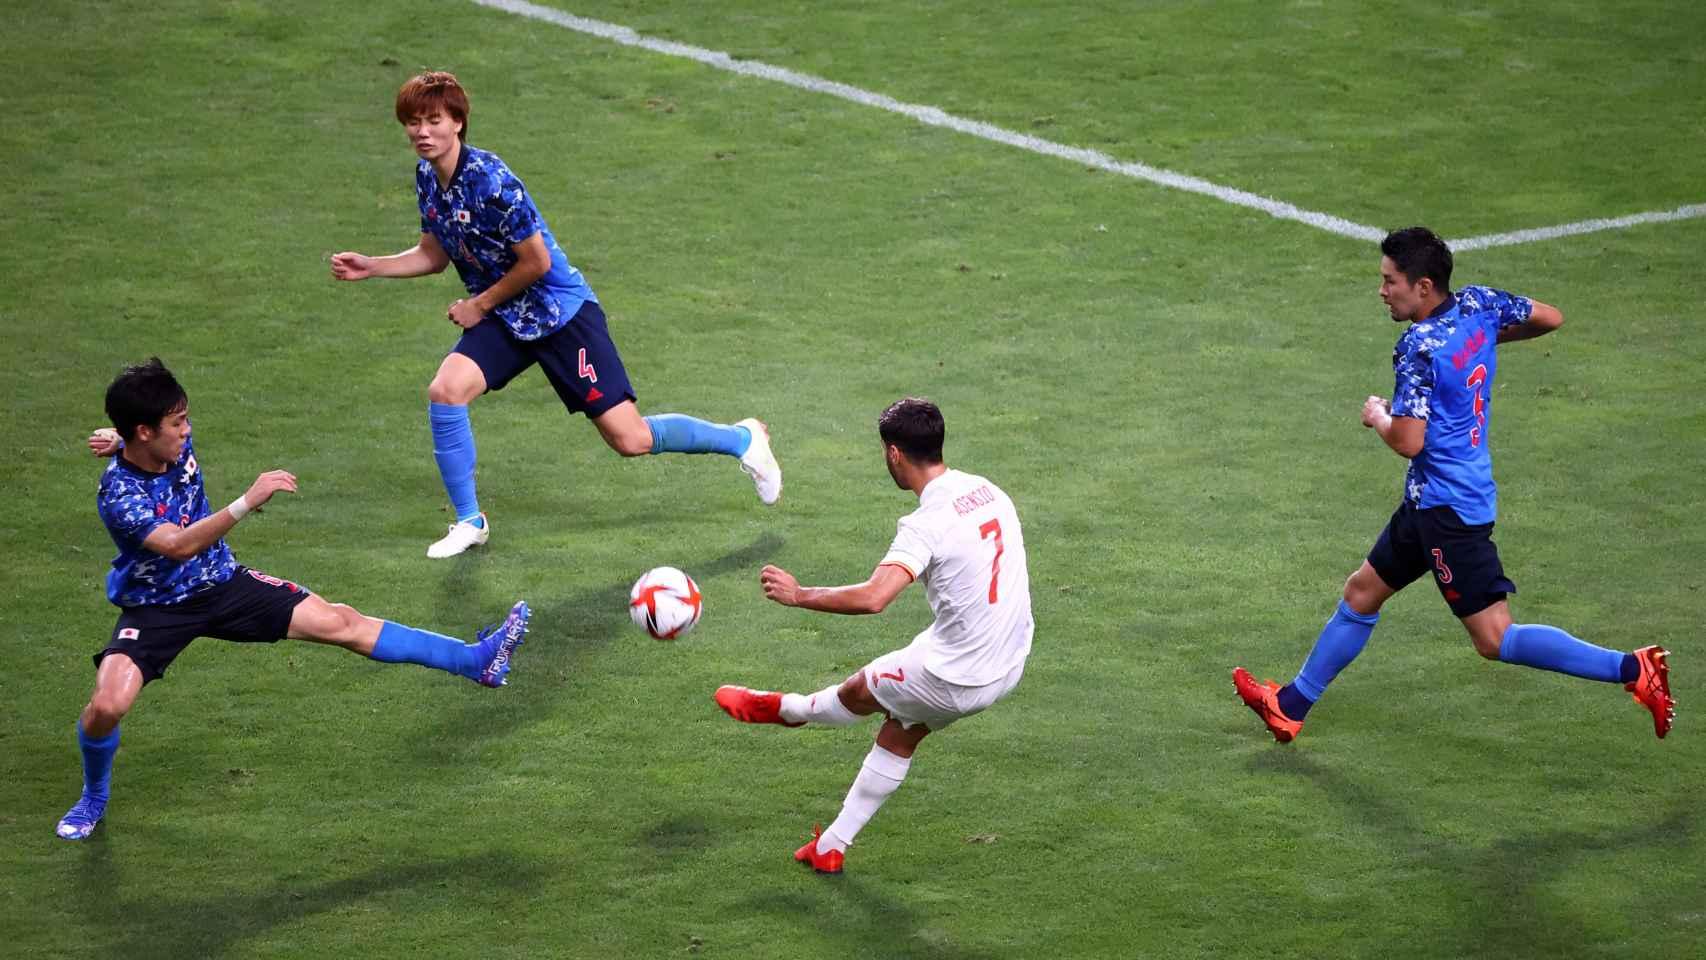 Momento del golpeo de Asensio que terminó en gol a Japón